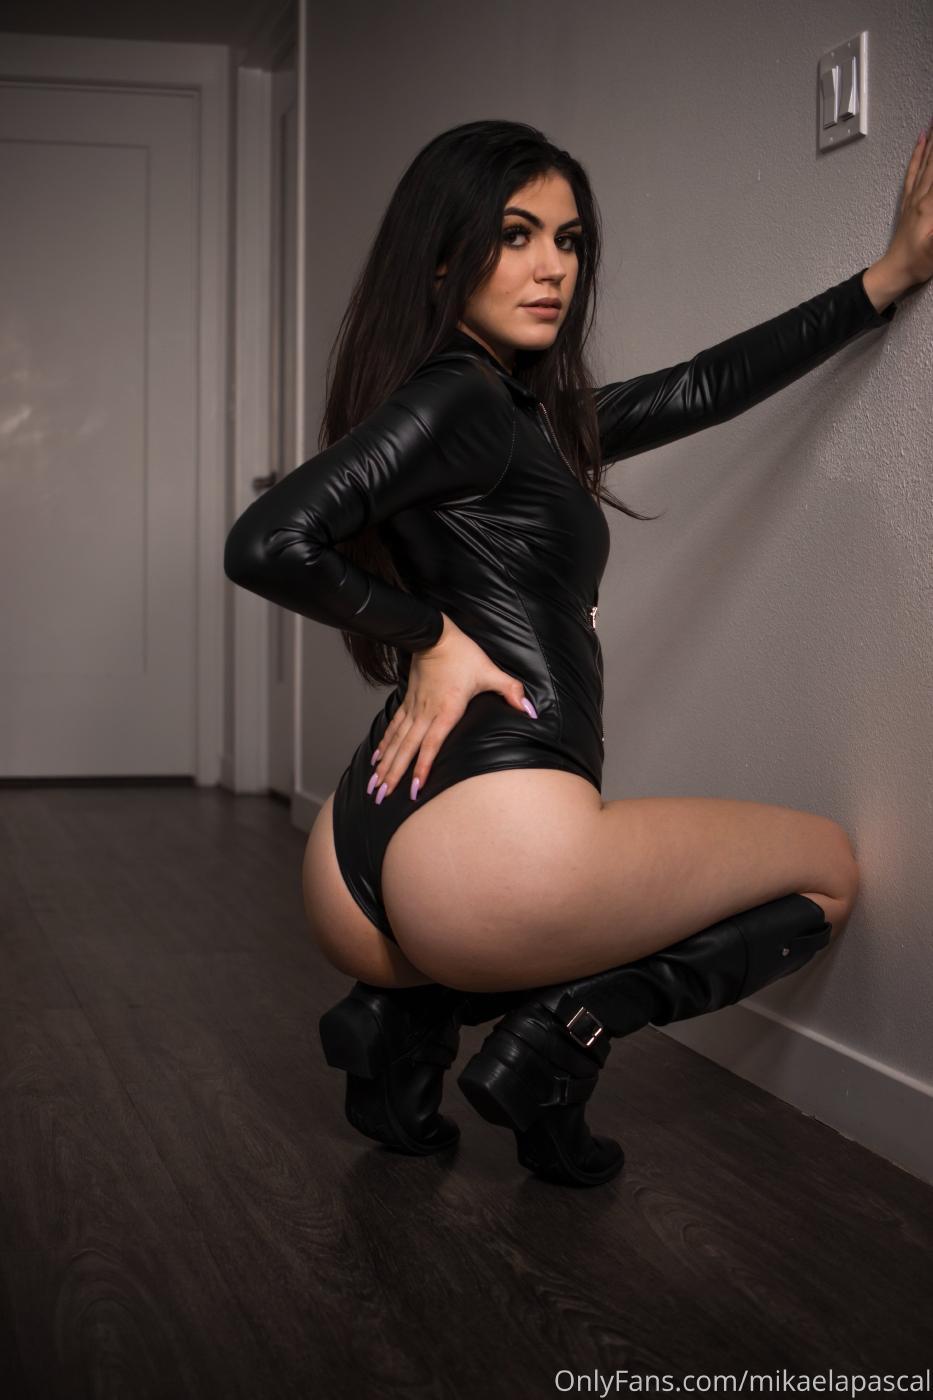 Mikaela Pascal Sexy Leather Bodysuit Onlyfans Set Leaked 0023